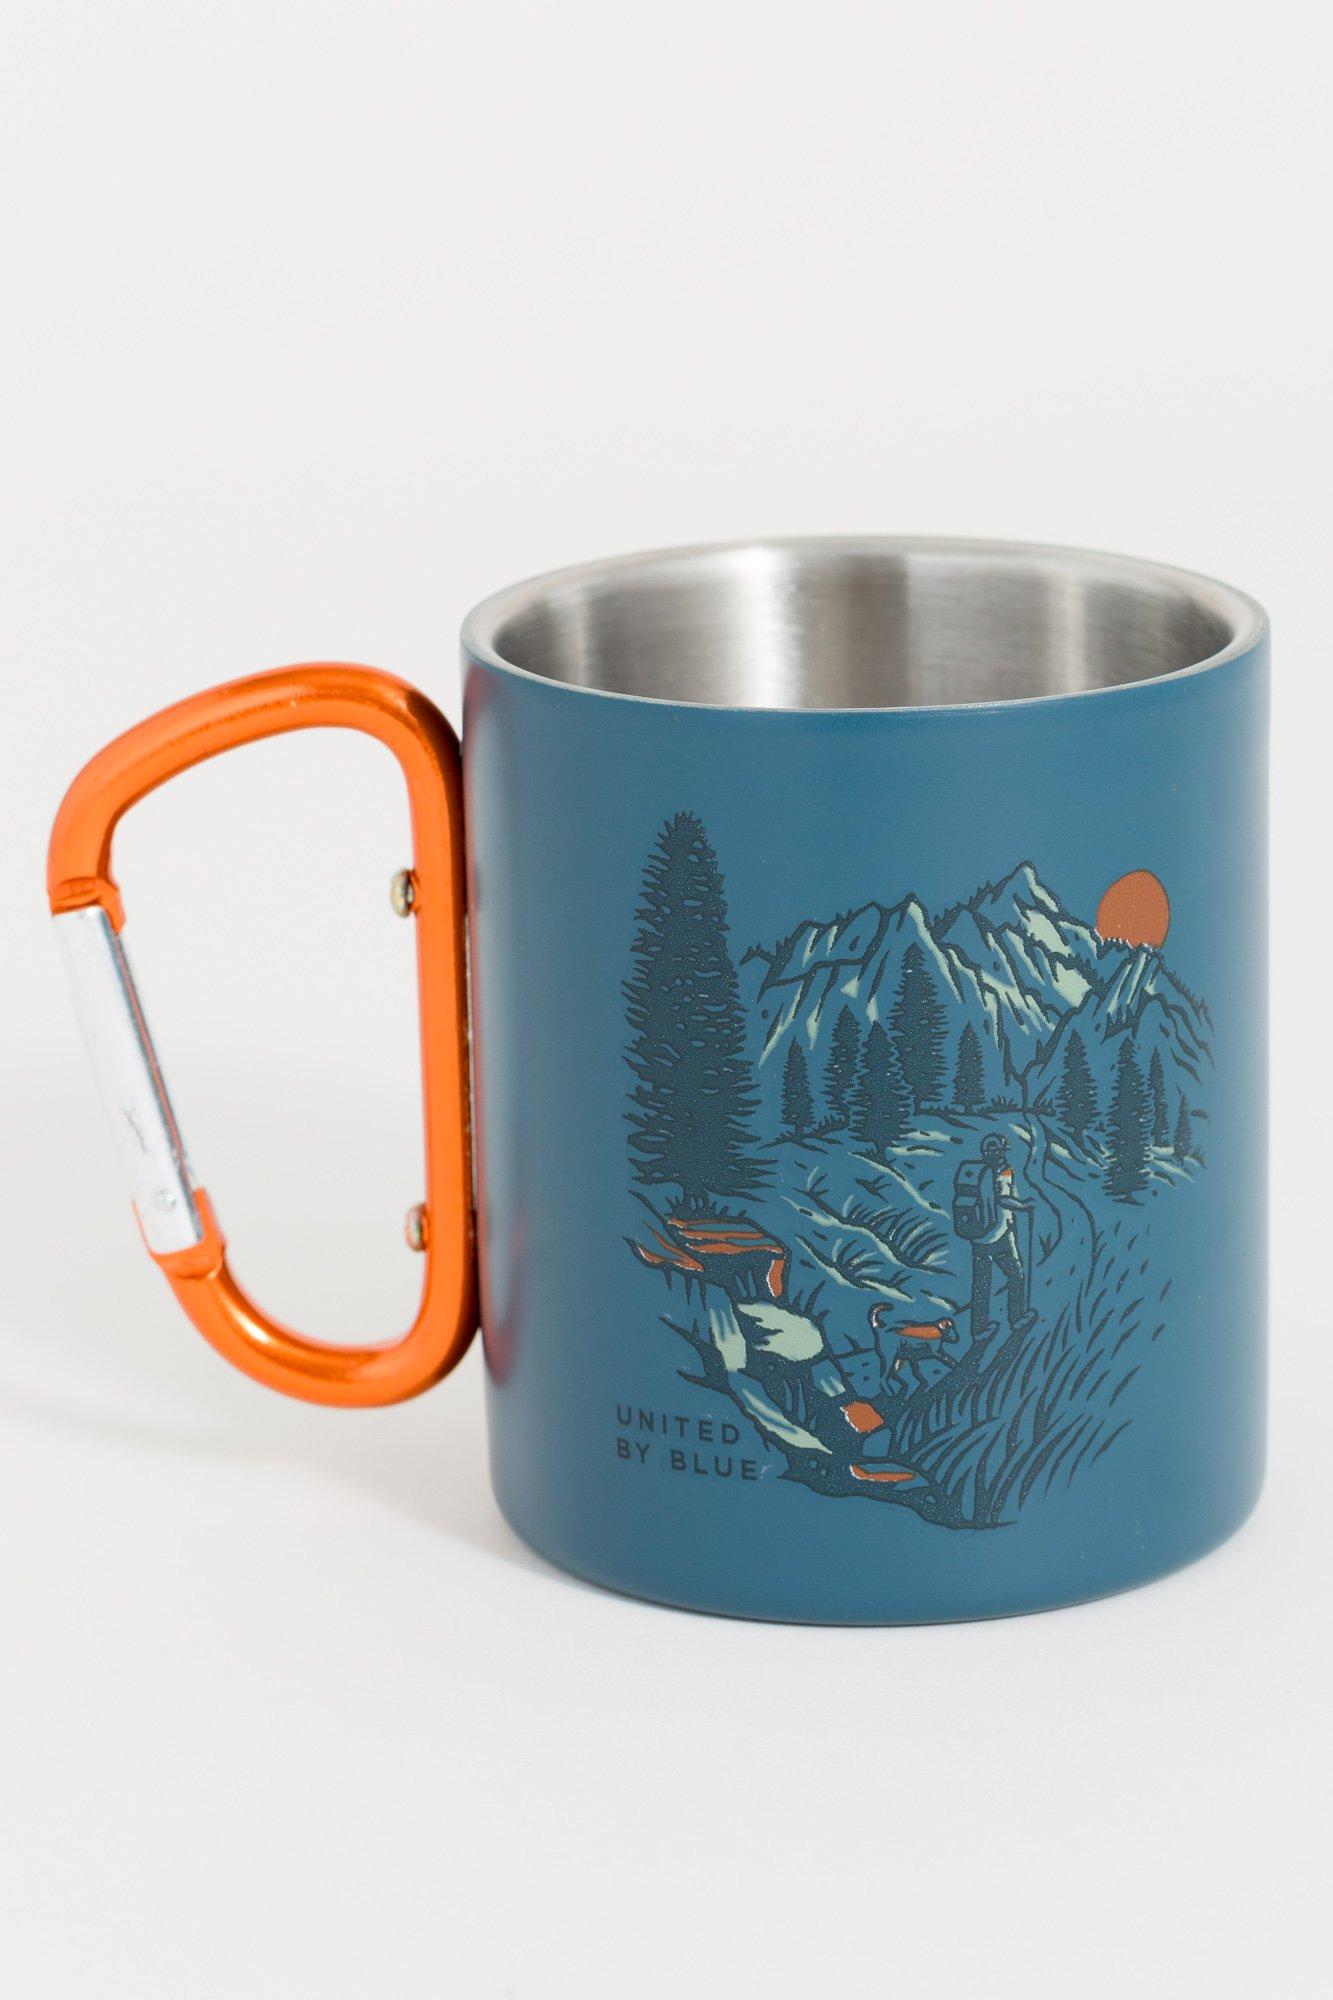 Passing Through 10 Oz Carabiner Cup Mugs Bathroom Cups Cute Coffee Mugs